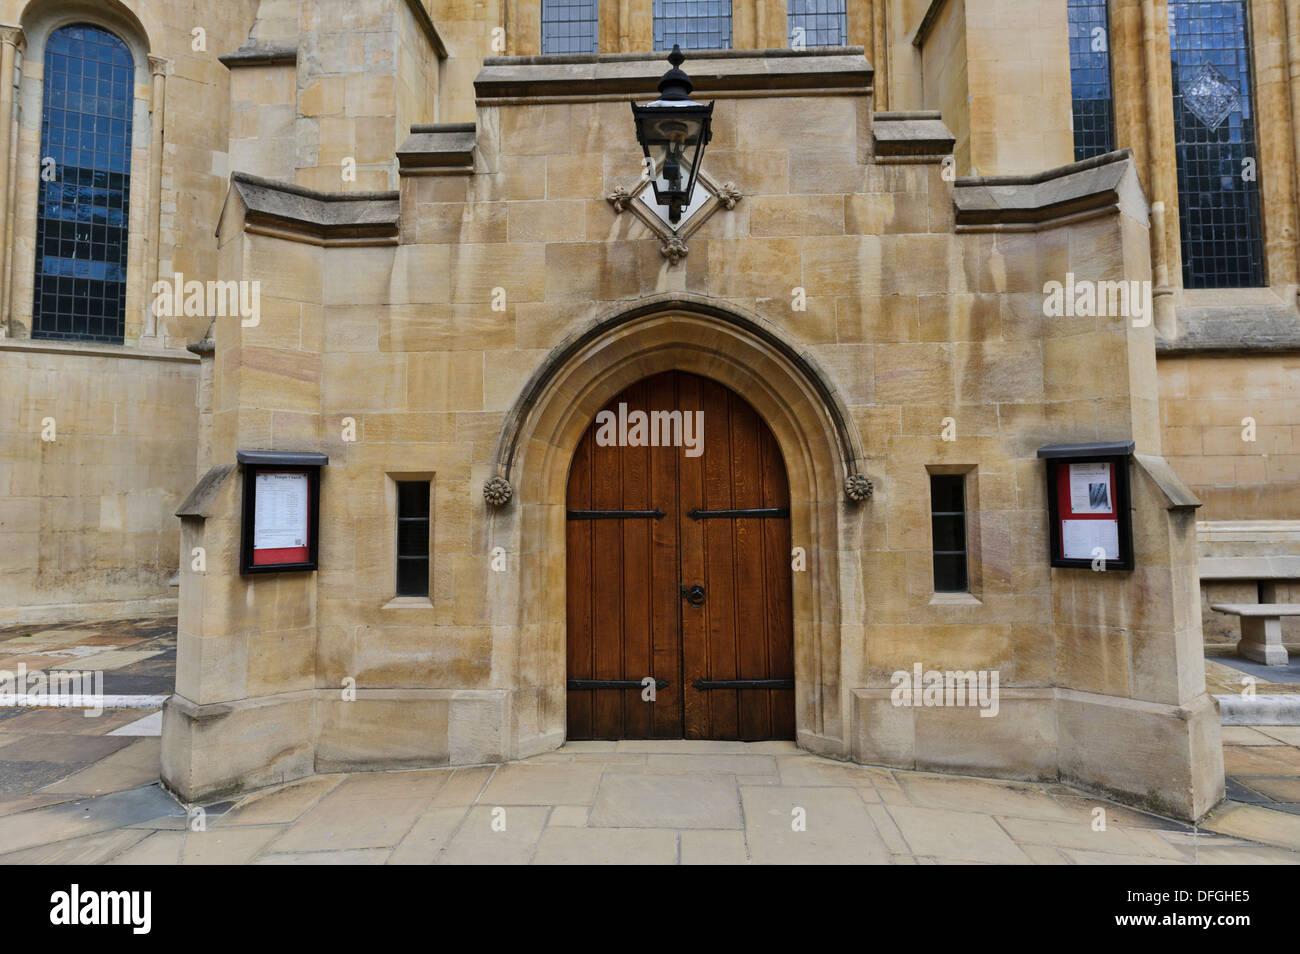 La entrada a la iglesia del Temple, Londres, Inglaterra, Reino Unido. Imagen De Stock